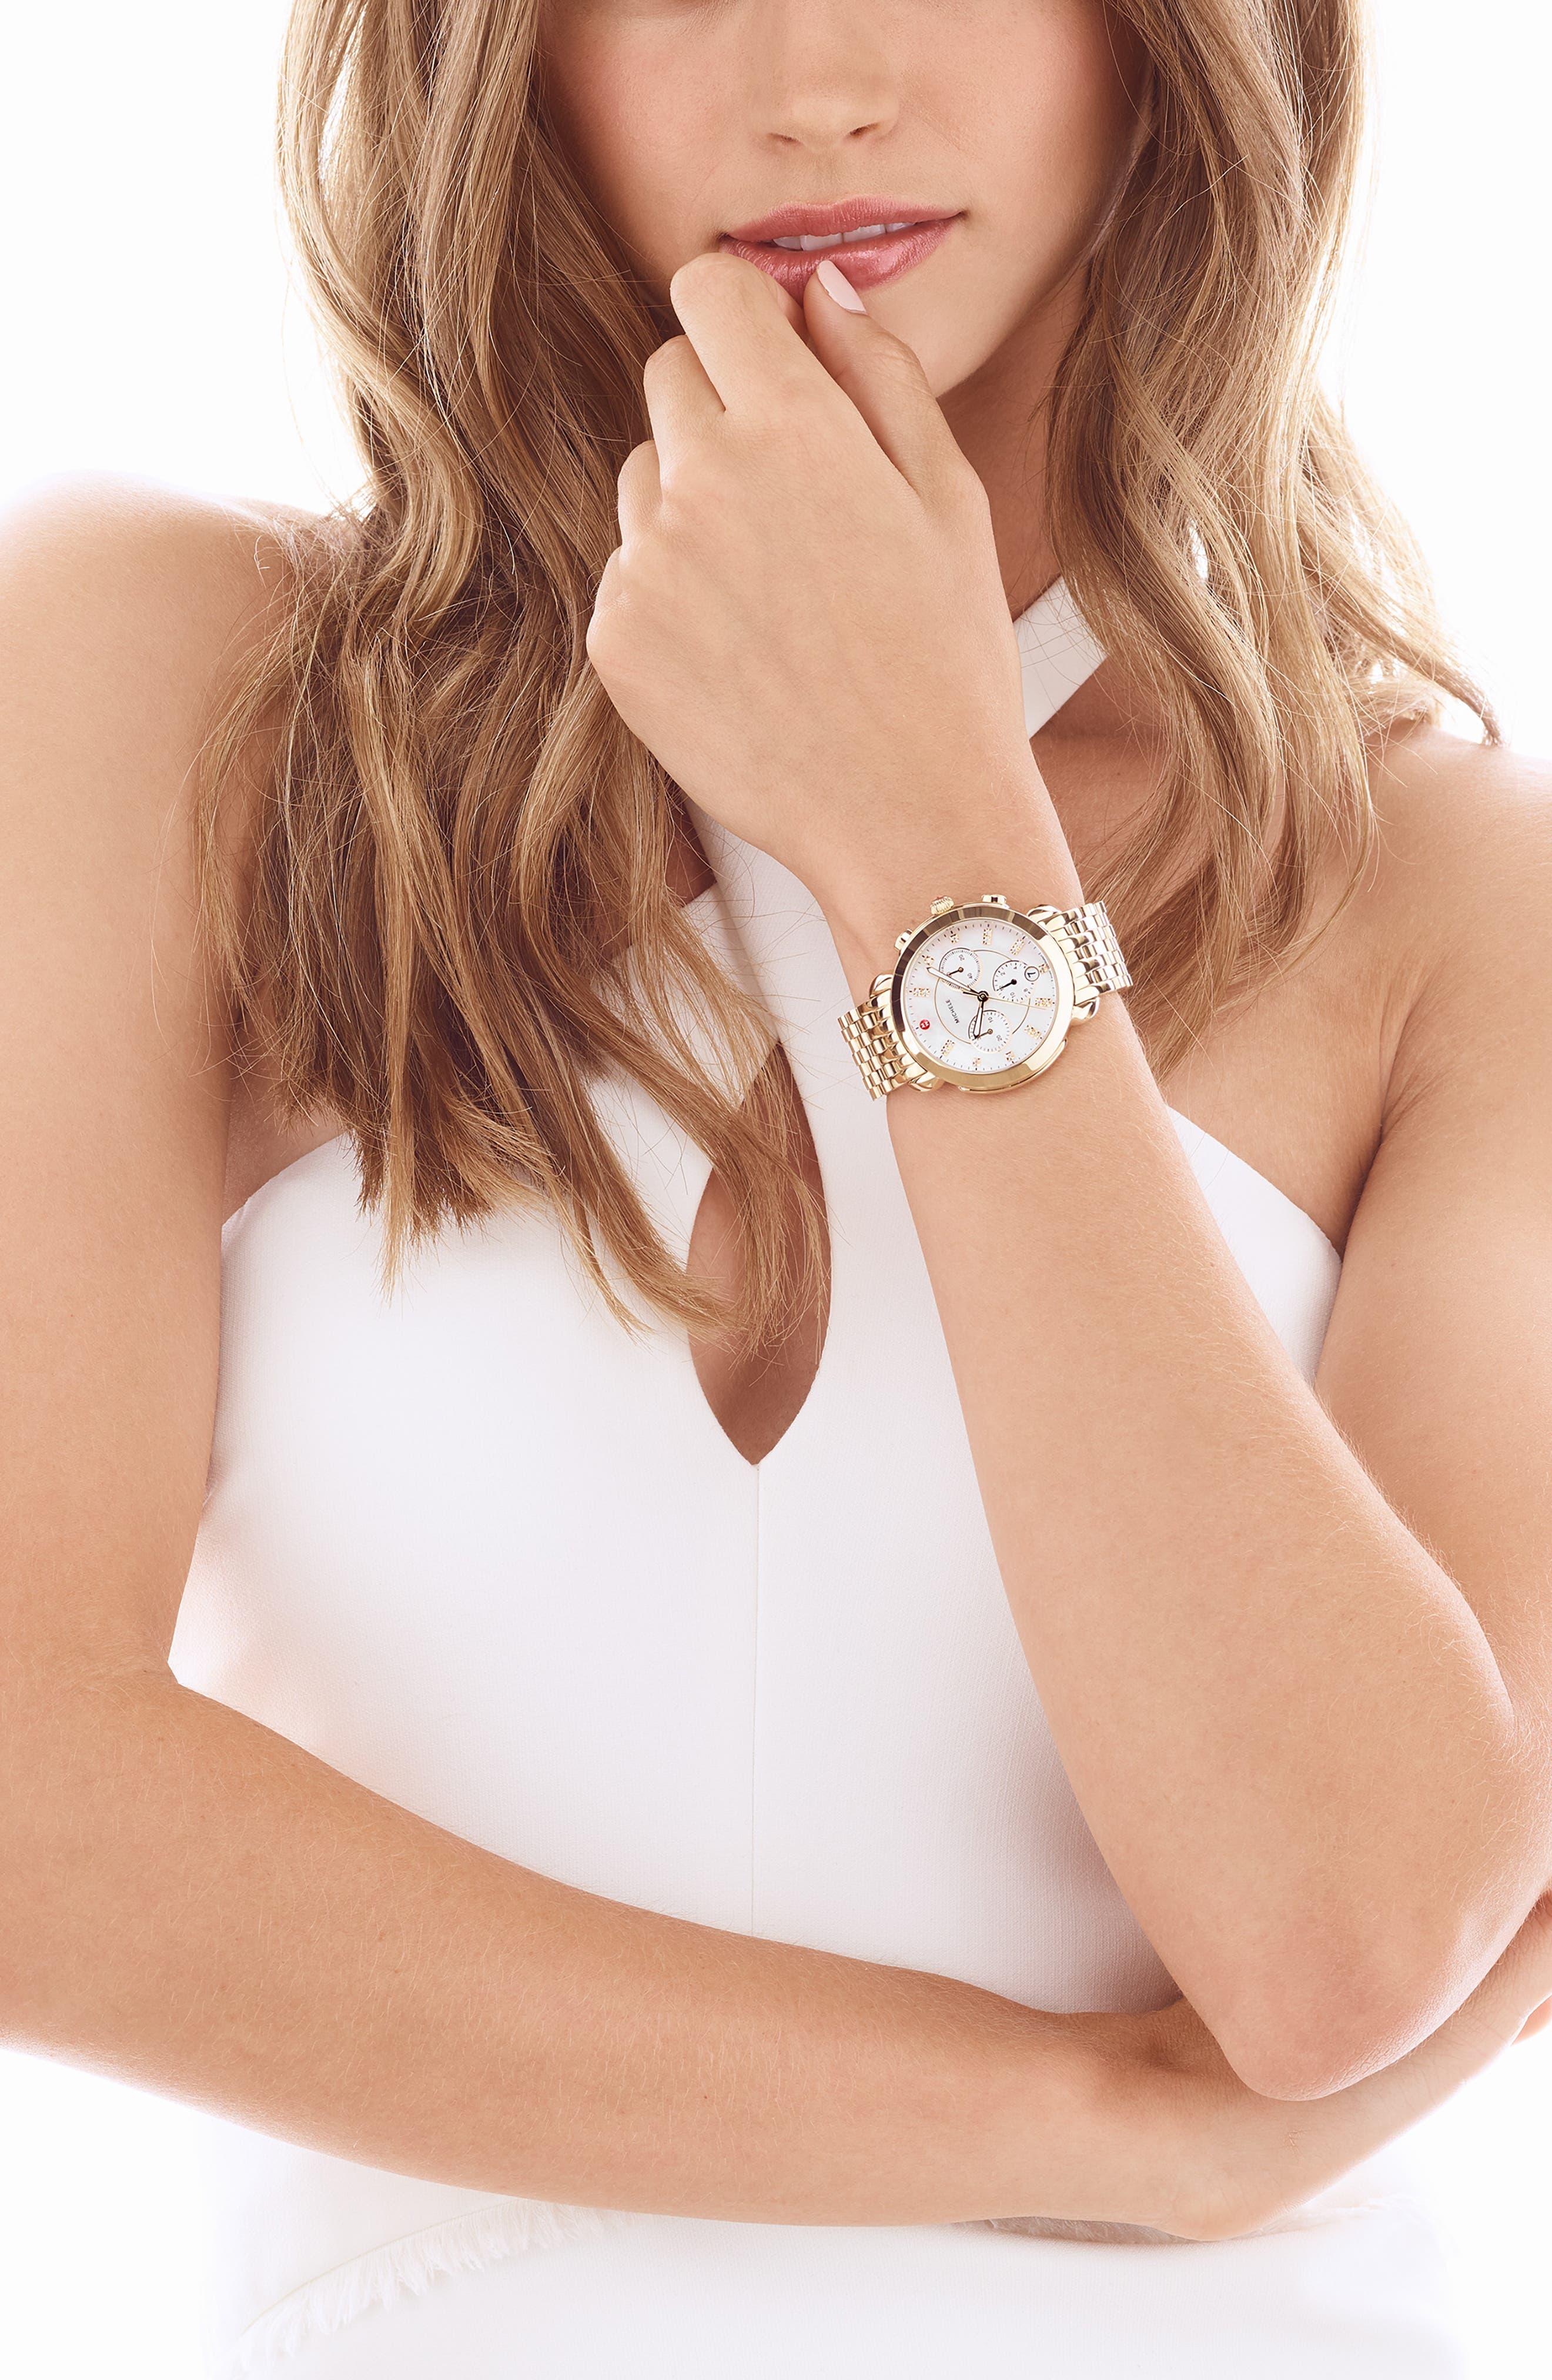 MICHELE, Sidney Chronograph Diamond Watch Head, 38mm, Main thumbnail 1, color, GOLD/ MOP